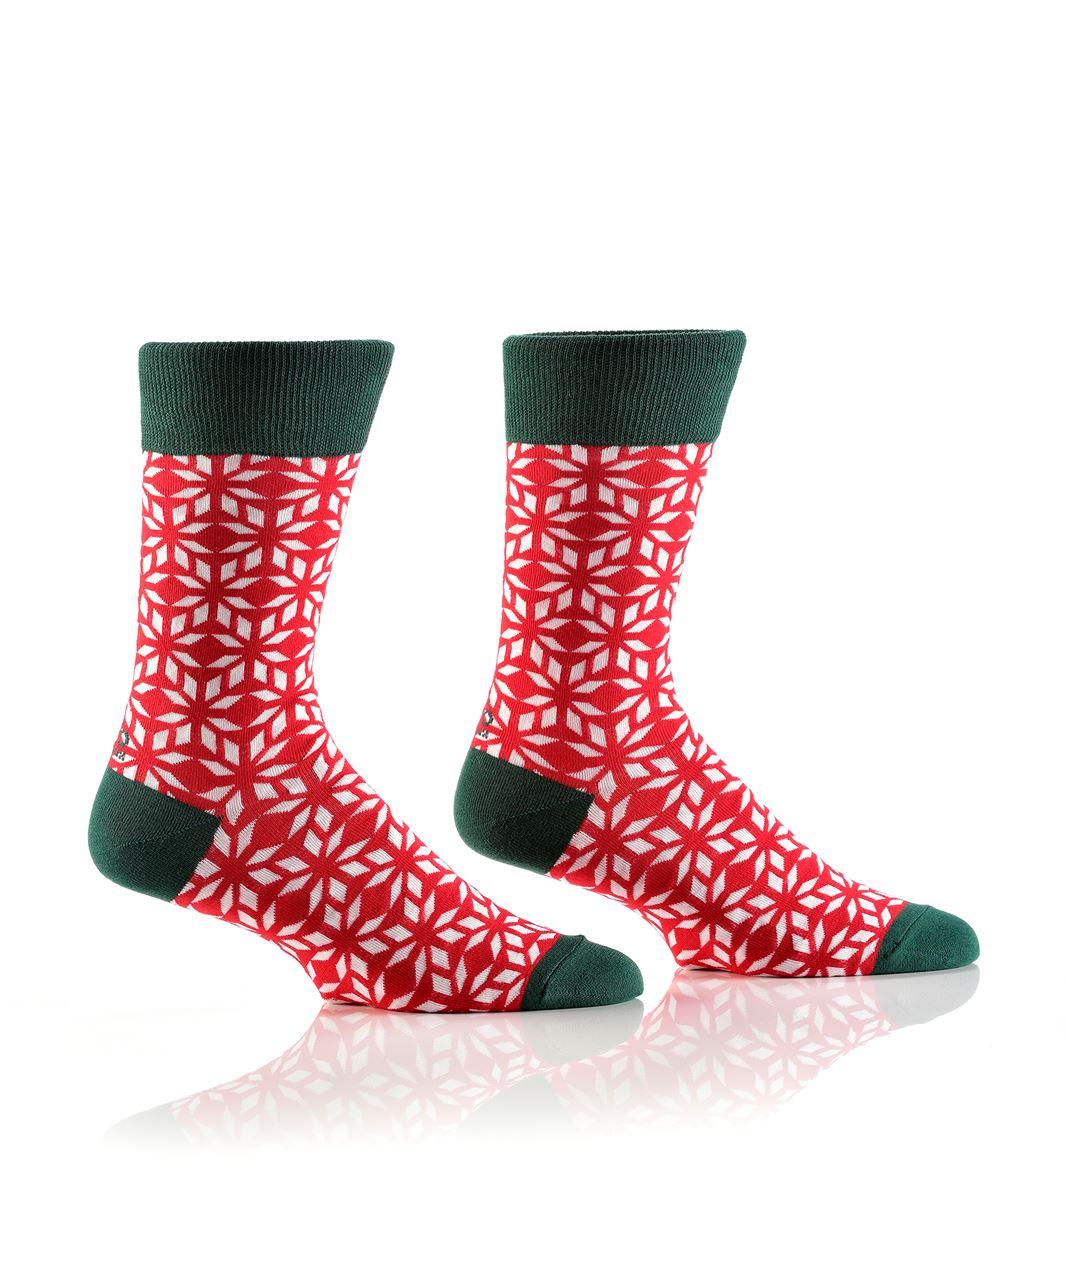 Peppermint Snowflakes Men's Crew Socks by Yo Sox